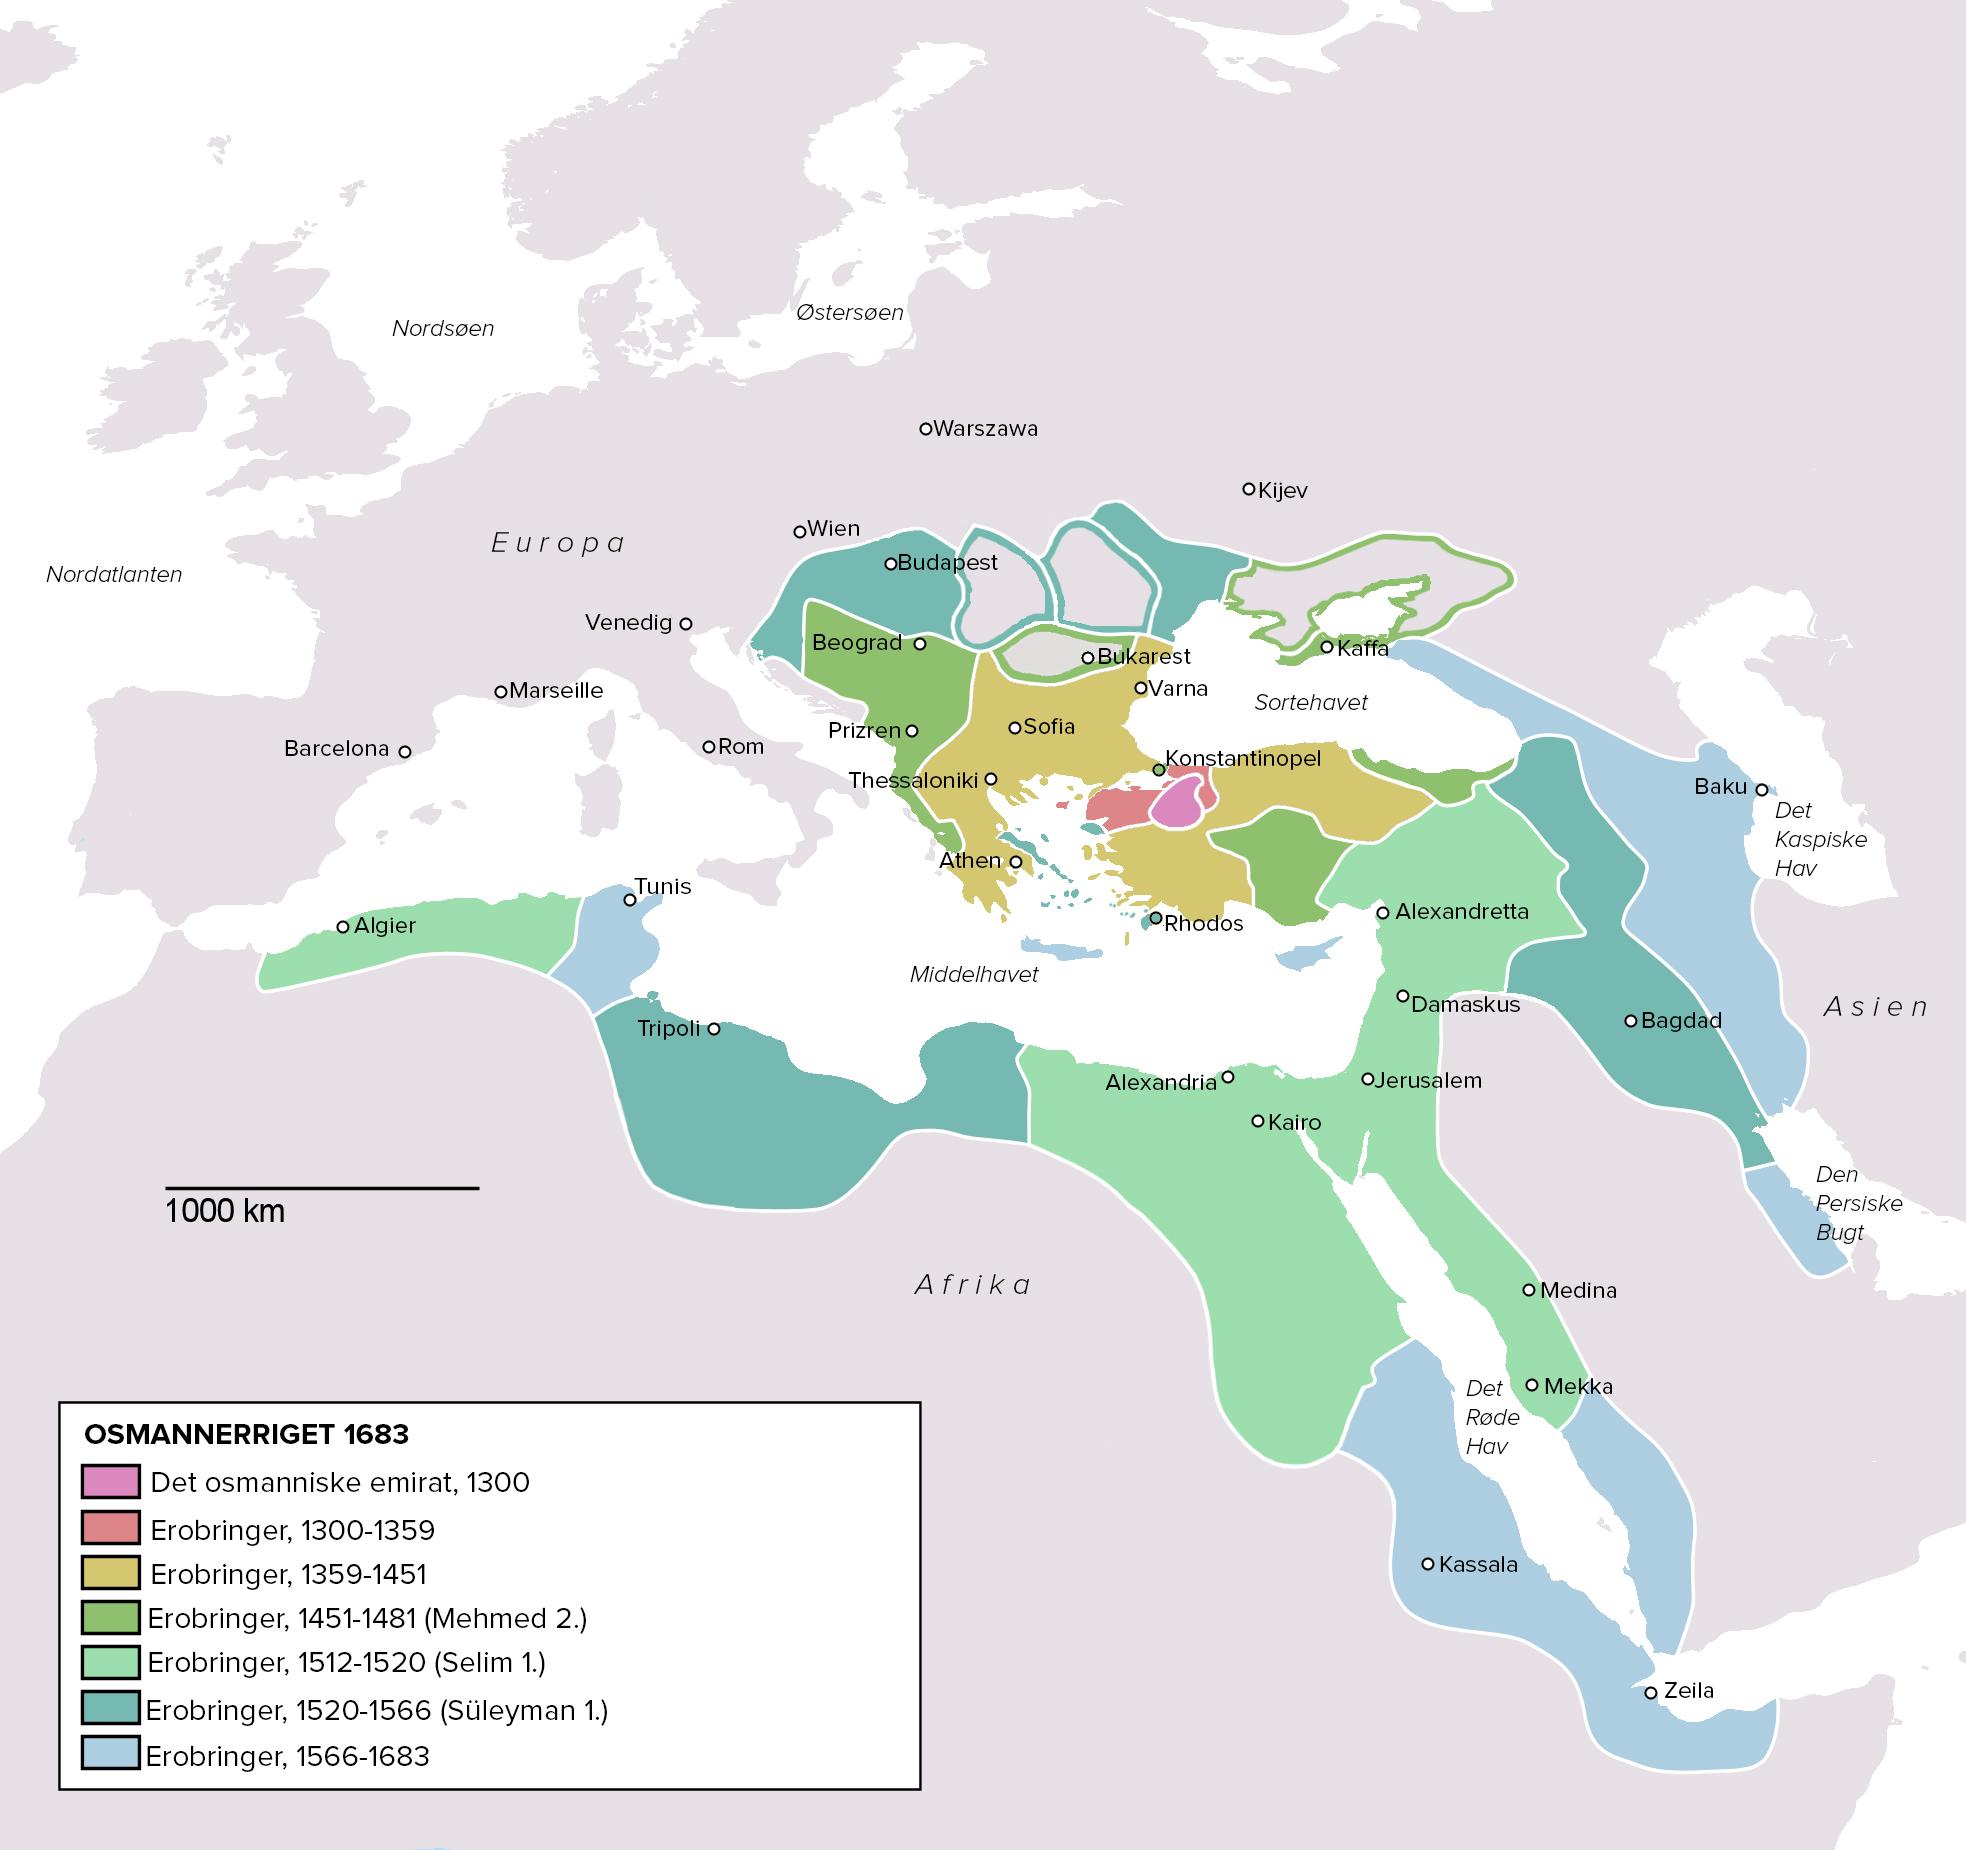 Osmannerriget